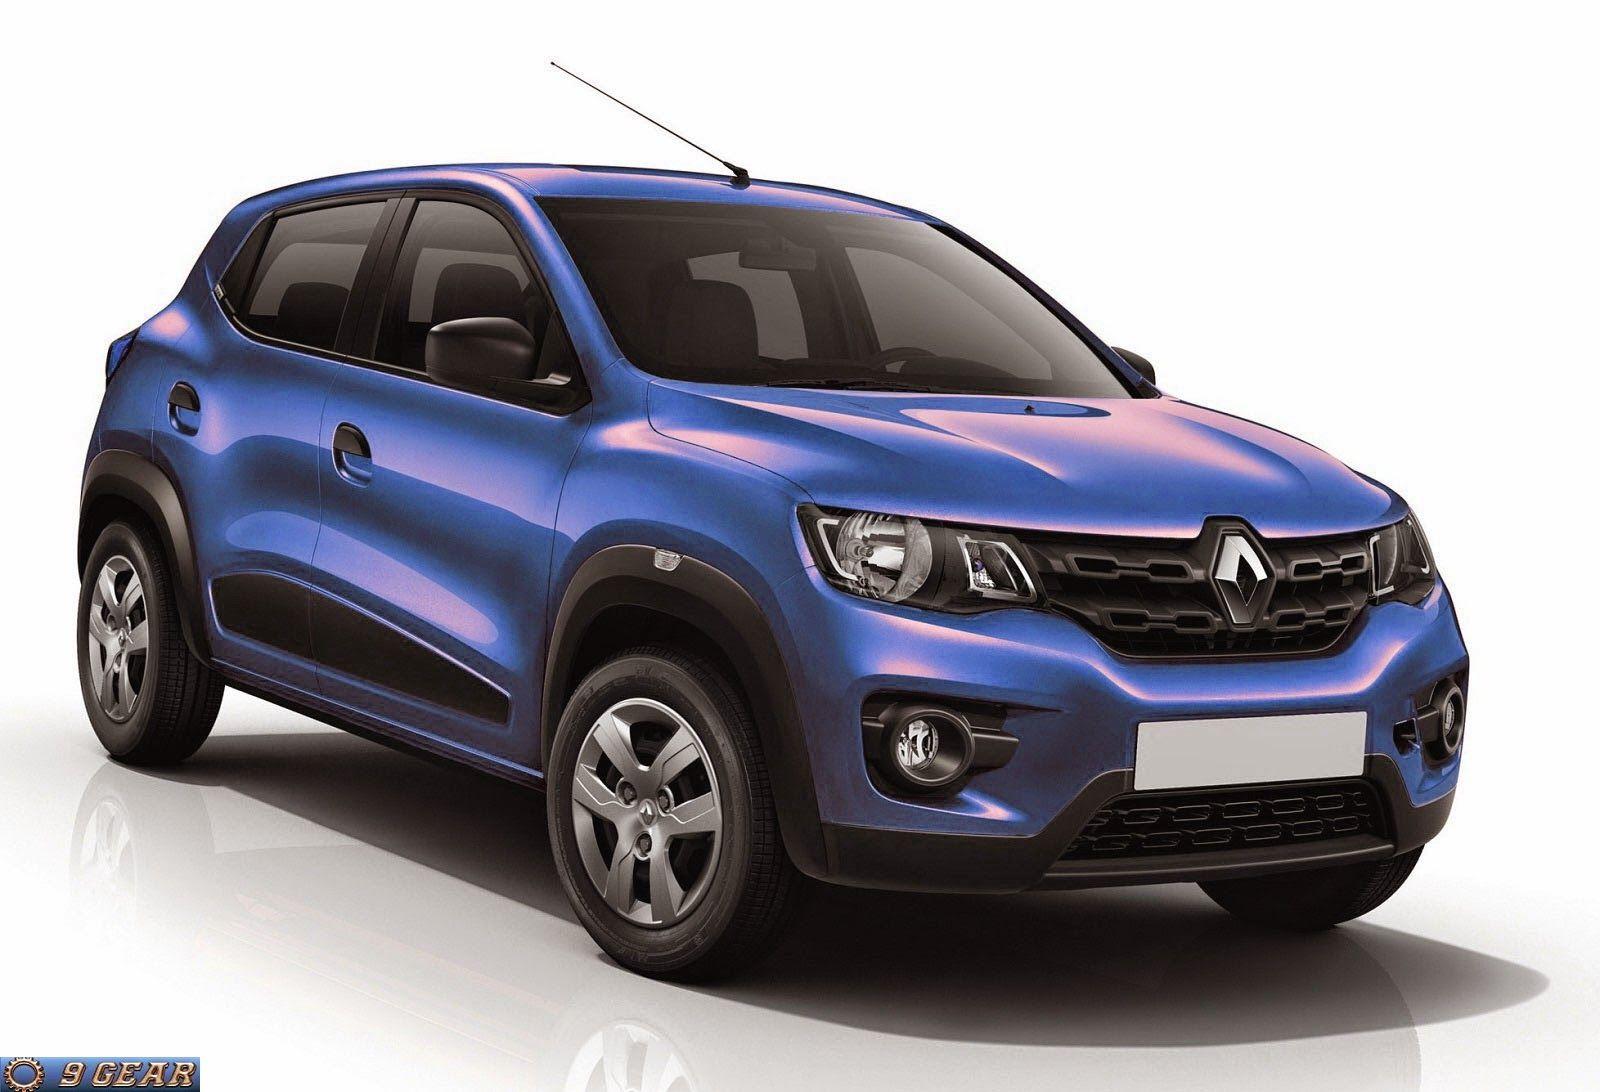 2020 Renault Kwid 2020 Renault Kwid, novo renault kwid